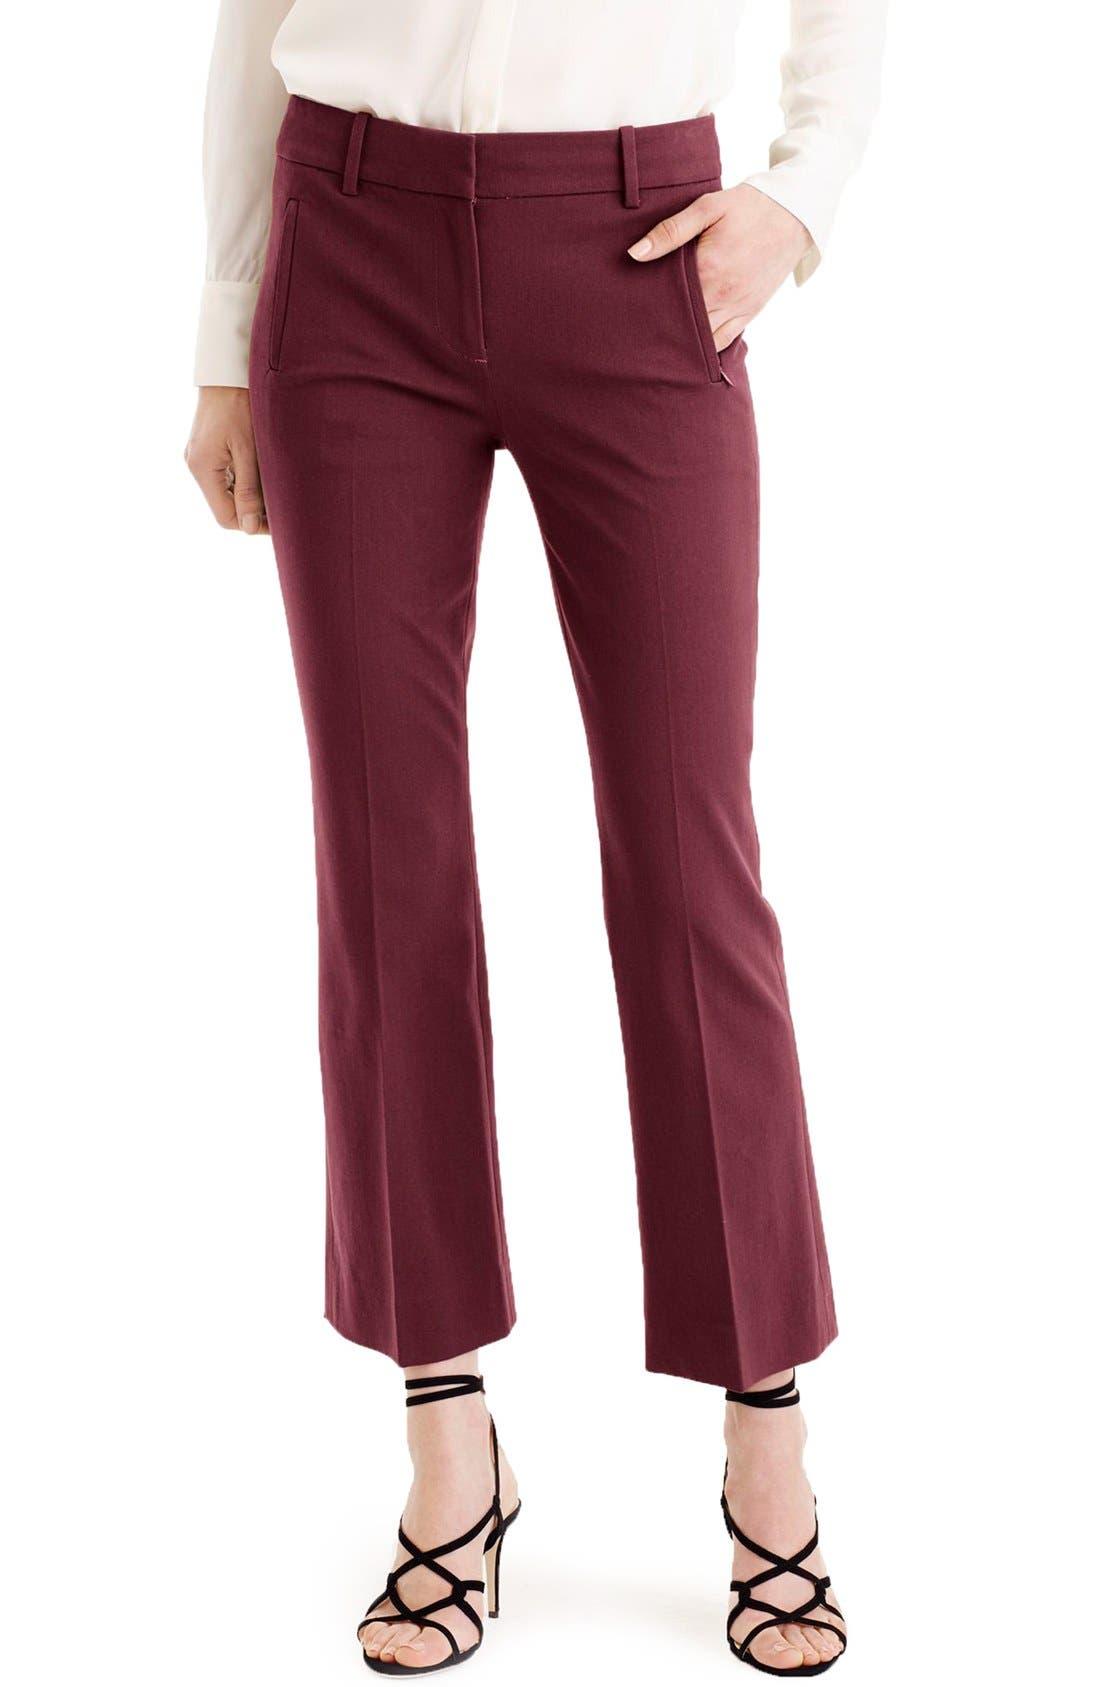 Main Image - J.Crew 'Teddie' Bi-Stretch Cotton Blend Pants (Regular & Petite)